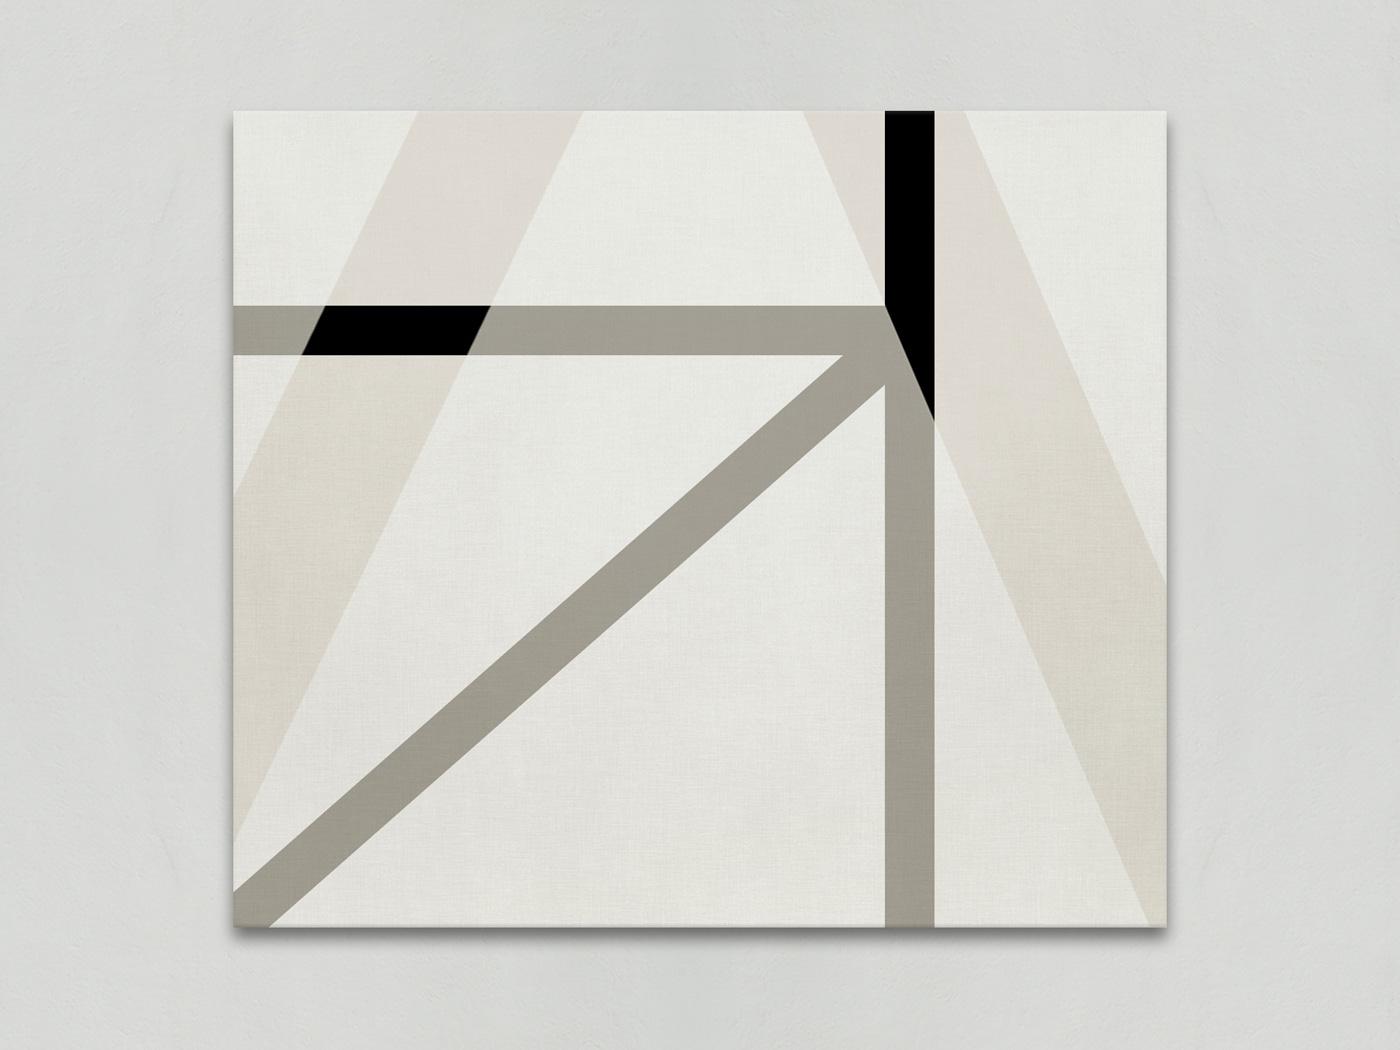 scaffold abstract Minimalism grid